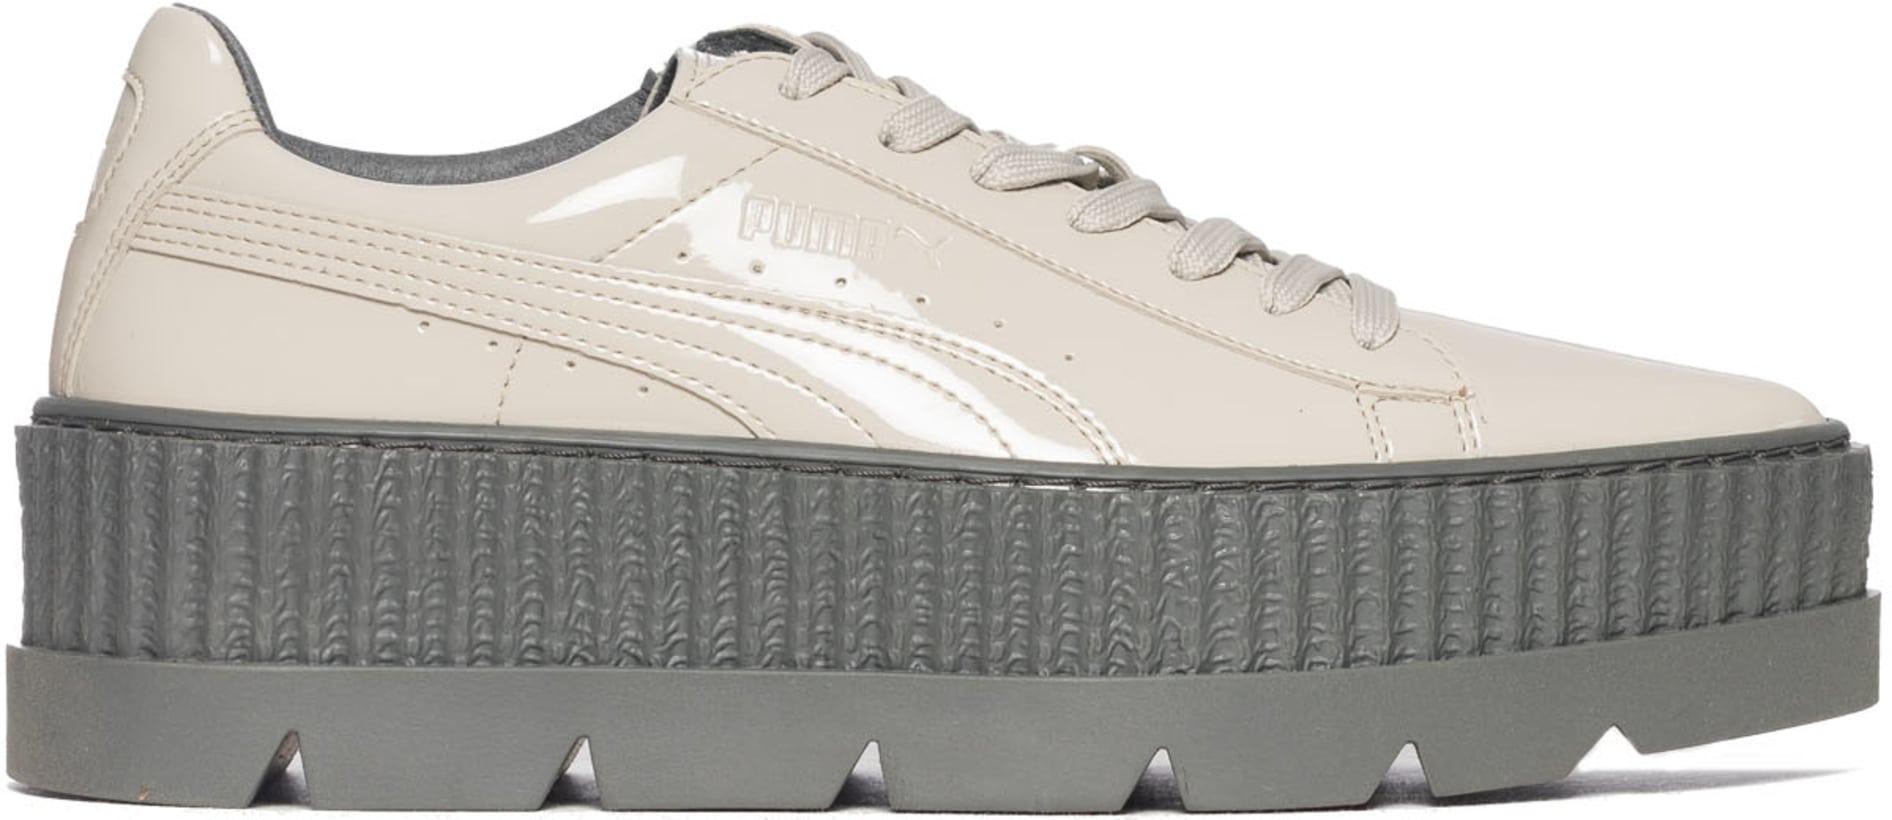 lowest price 31d6d e169d Puma - Fenty Pointy Creeper Patent- Dove/Glacier Grey